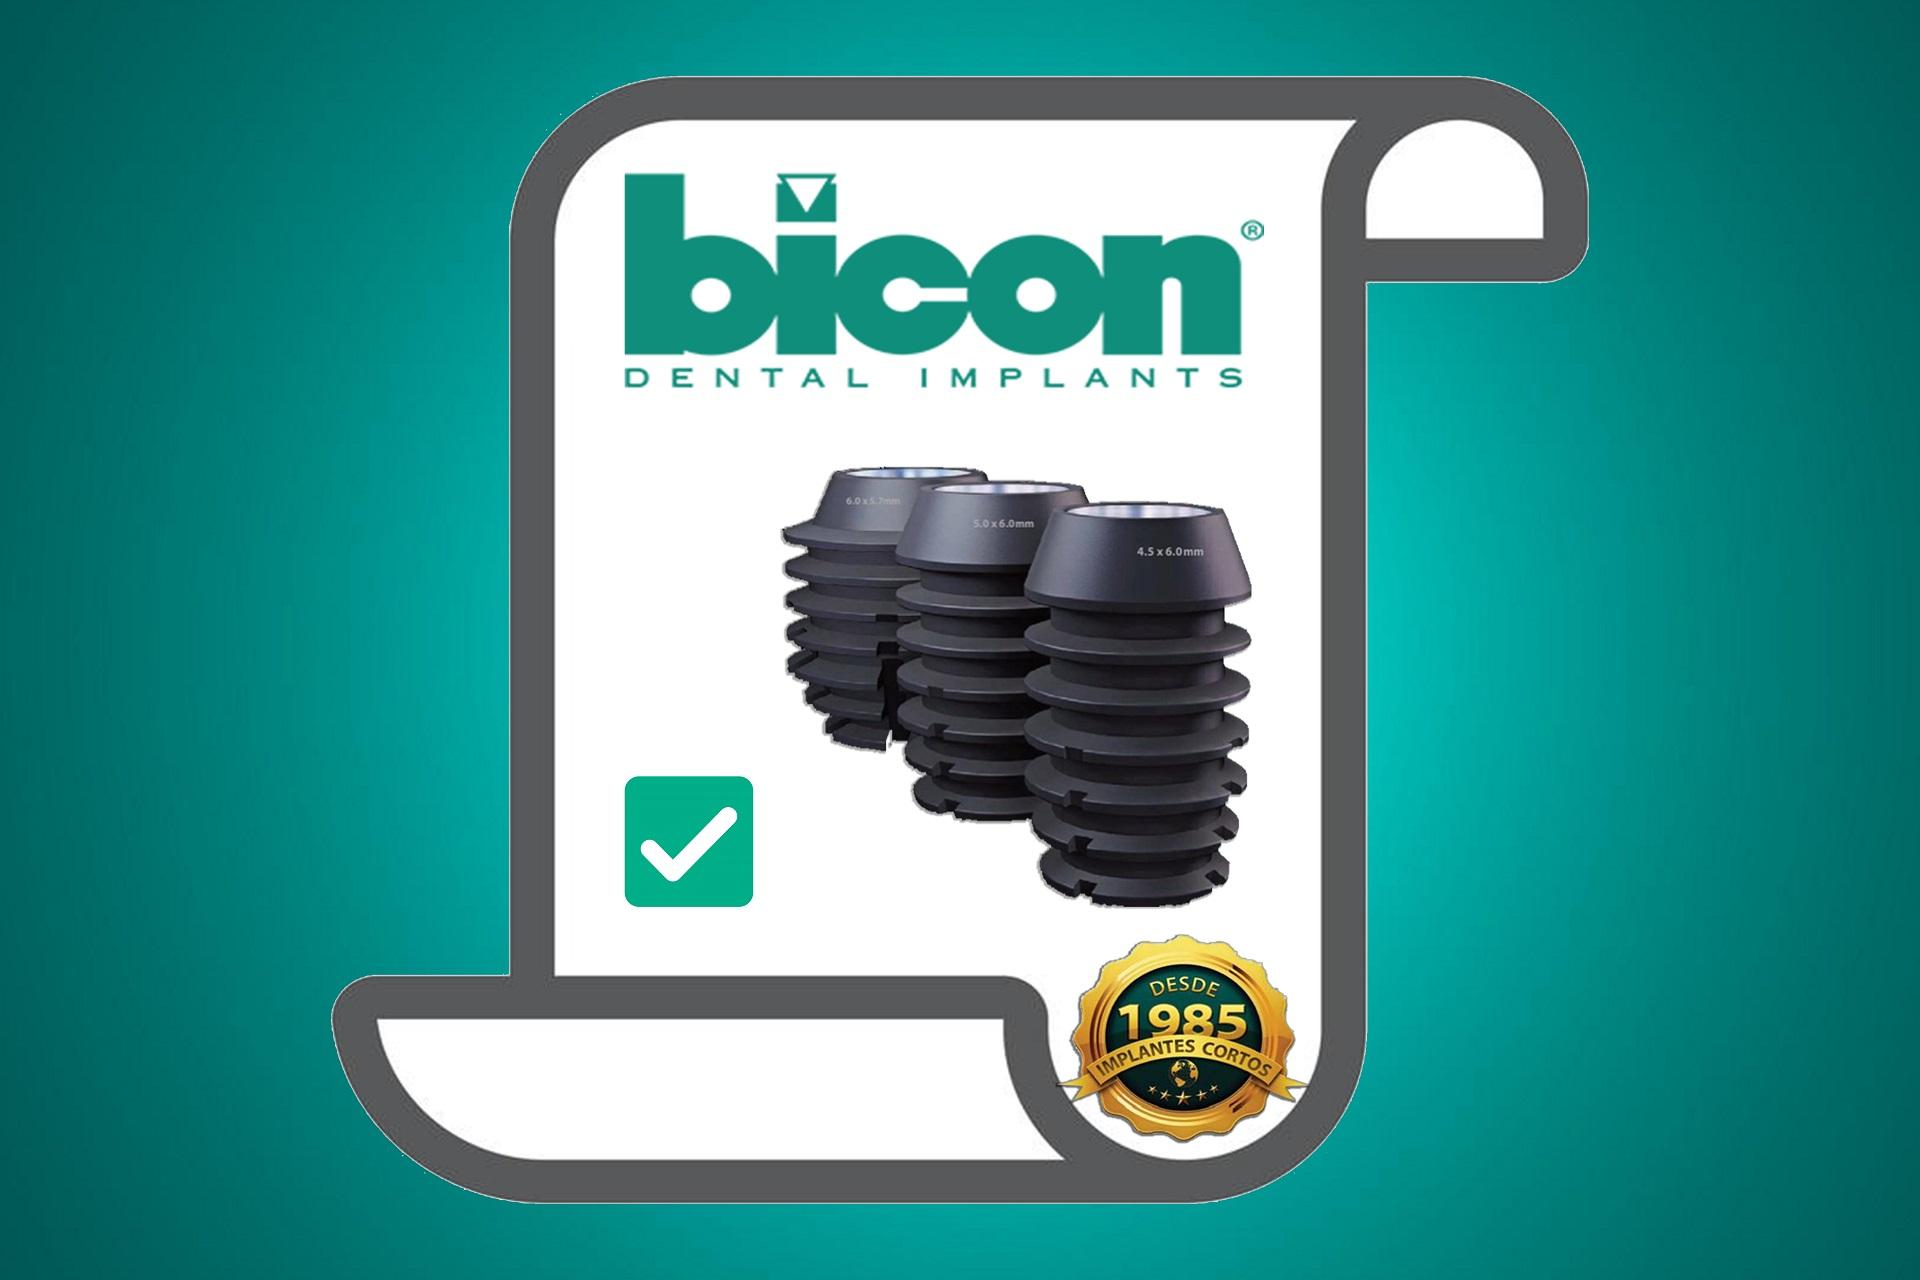 https://biconmexico.com/wp-content/uploads/2021/04/10.jpg